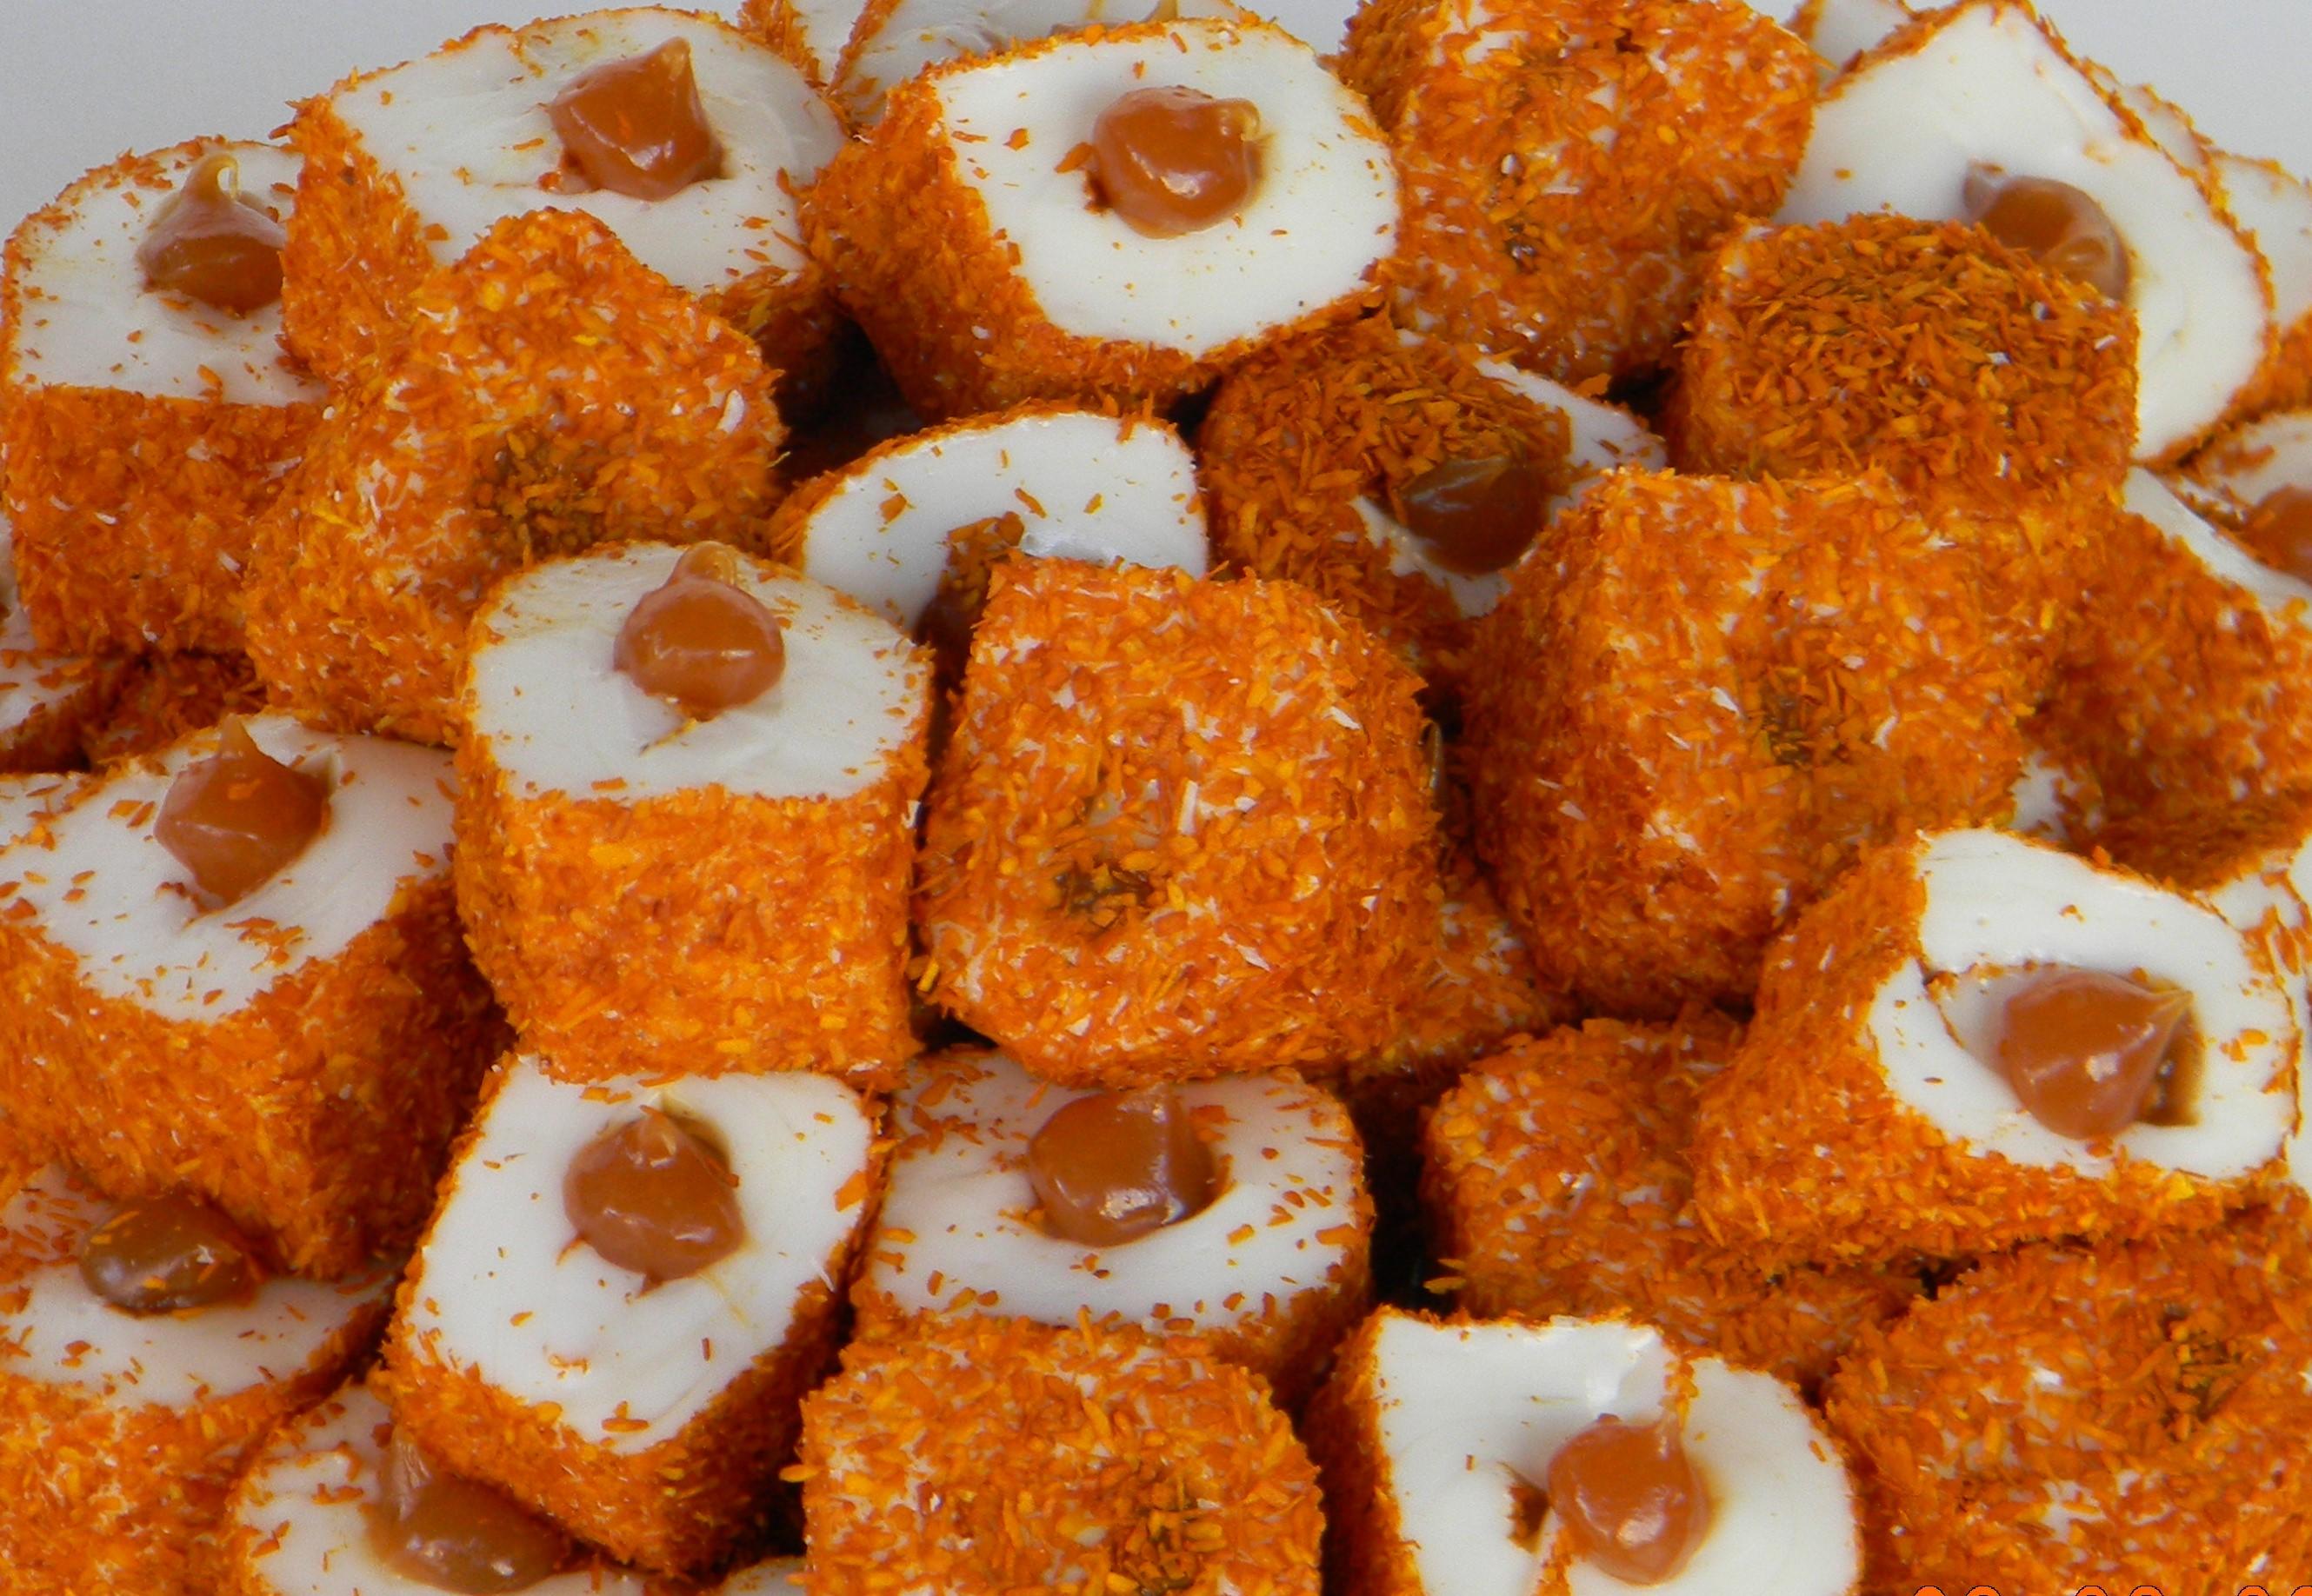 Caramel Stuffed Turkish Delight